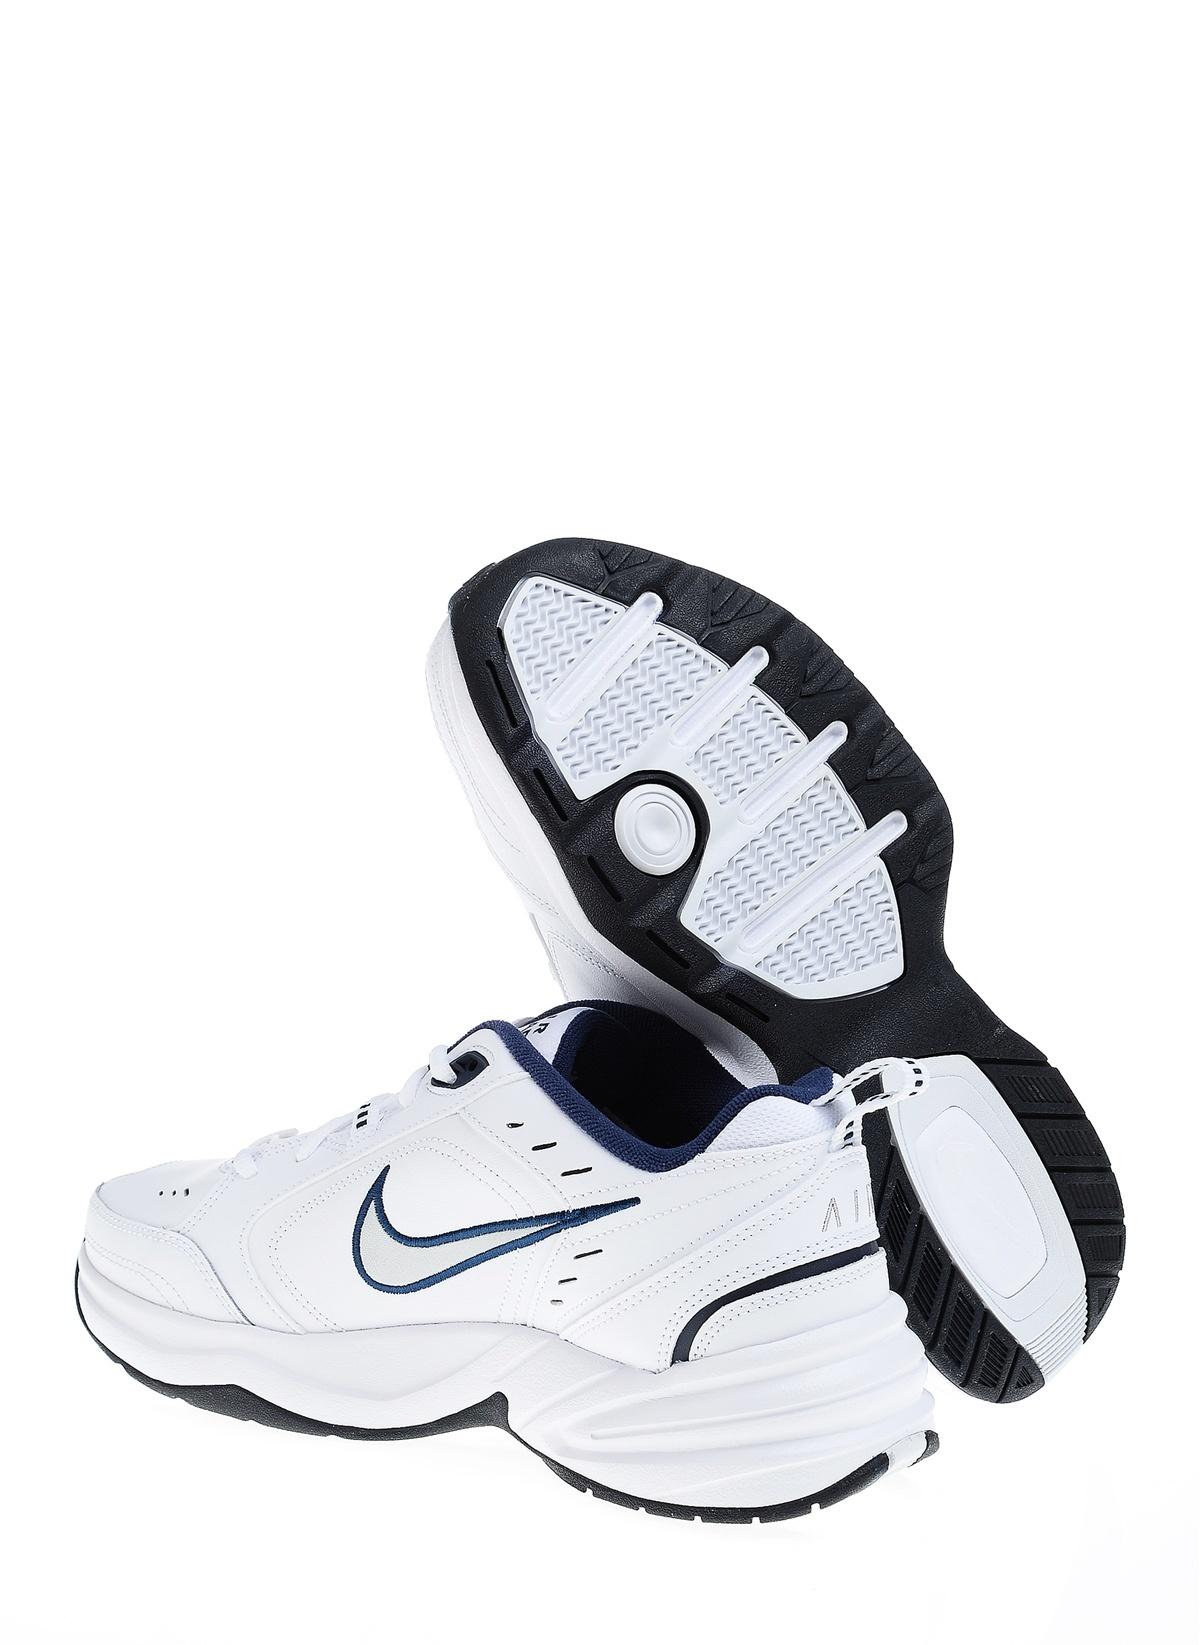 premium selection c884c b7dfc ... Nike Air Monarch IV Beyaz ...